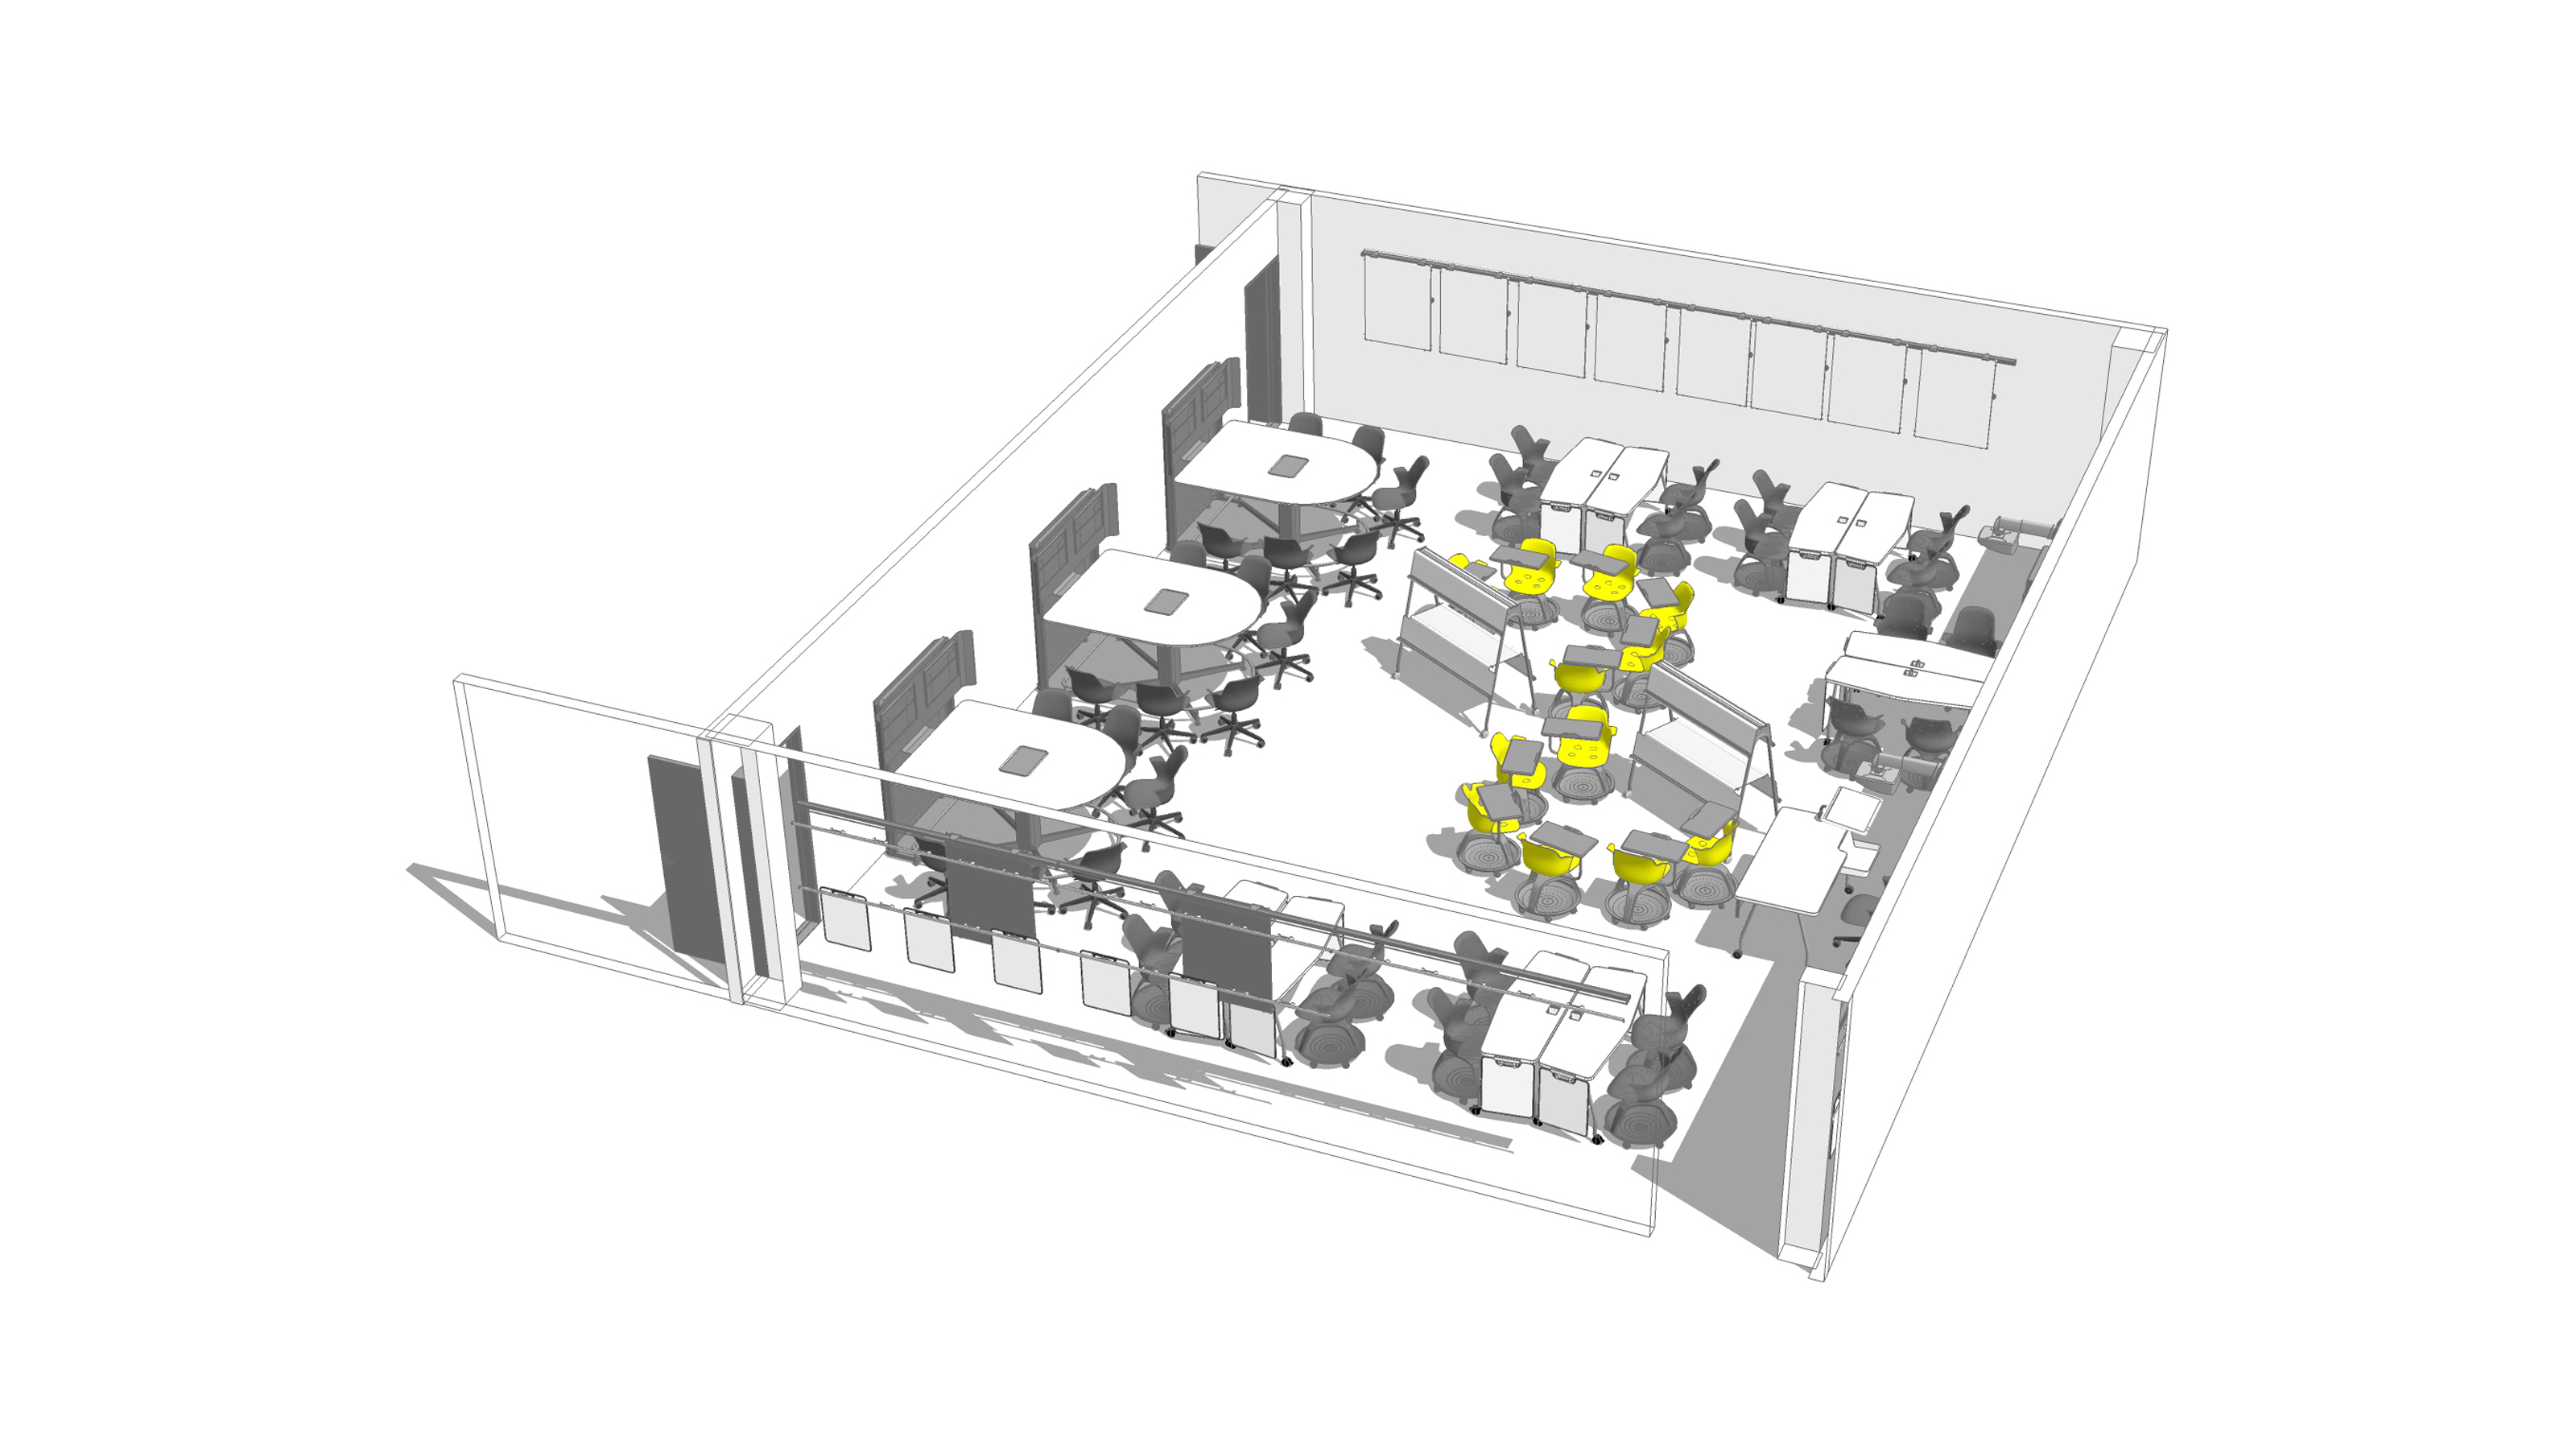 2d amp 3d space planning ecos office furniture - 1301xg3v